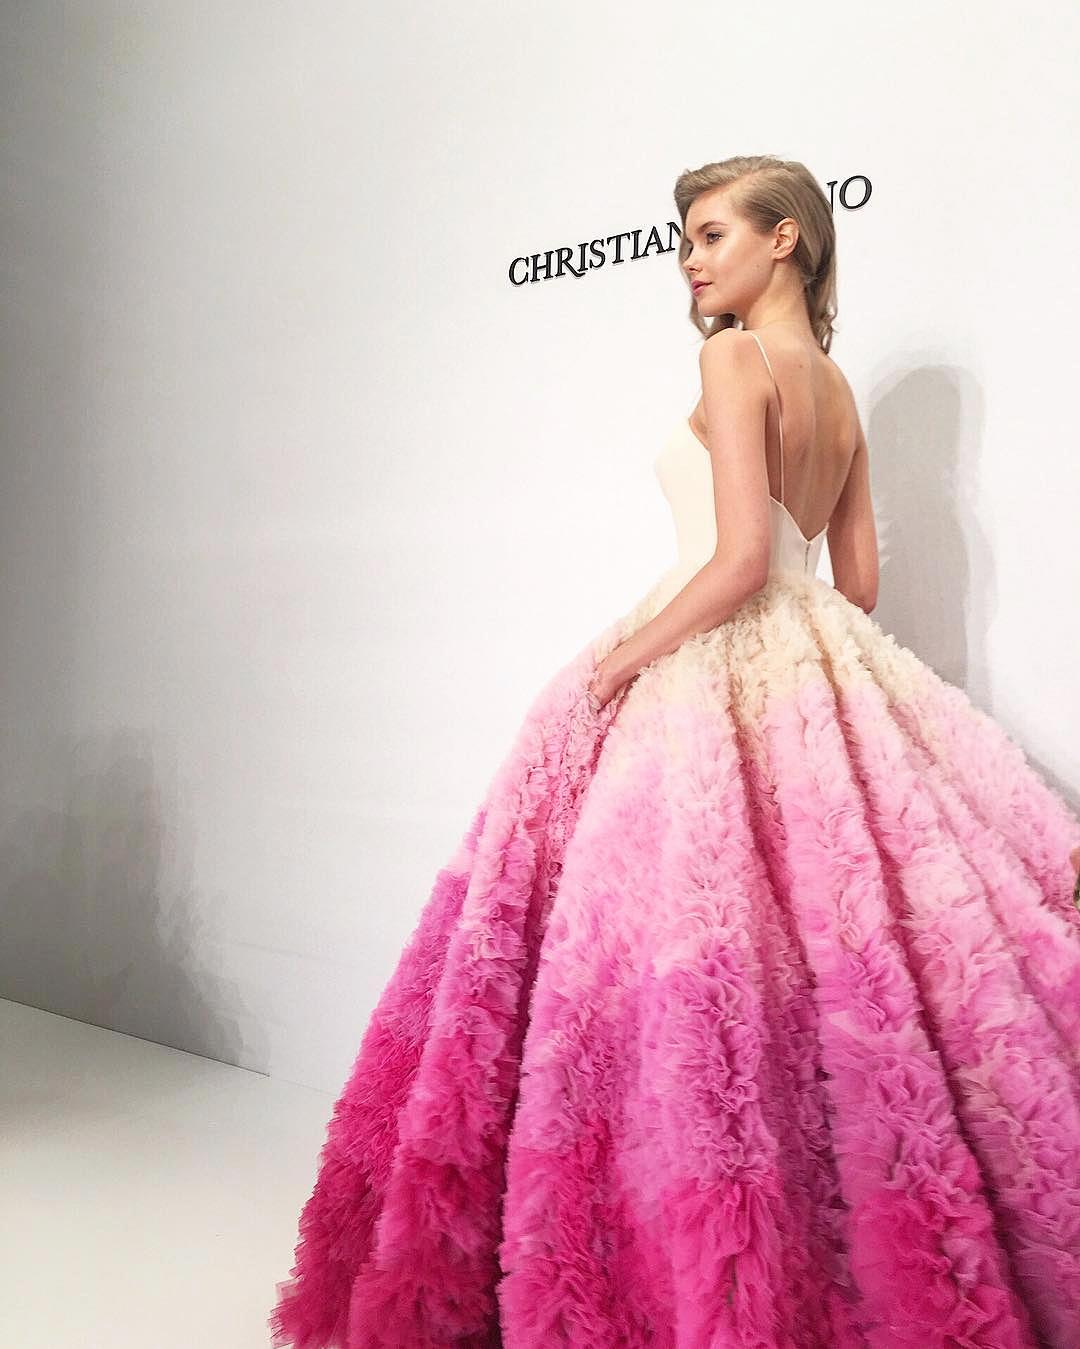 instagram-photos-christian-siriano-pink-ombre-ball-gown-bridal-fashion-week-0716.jpg